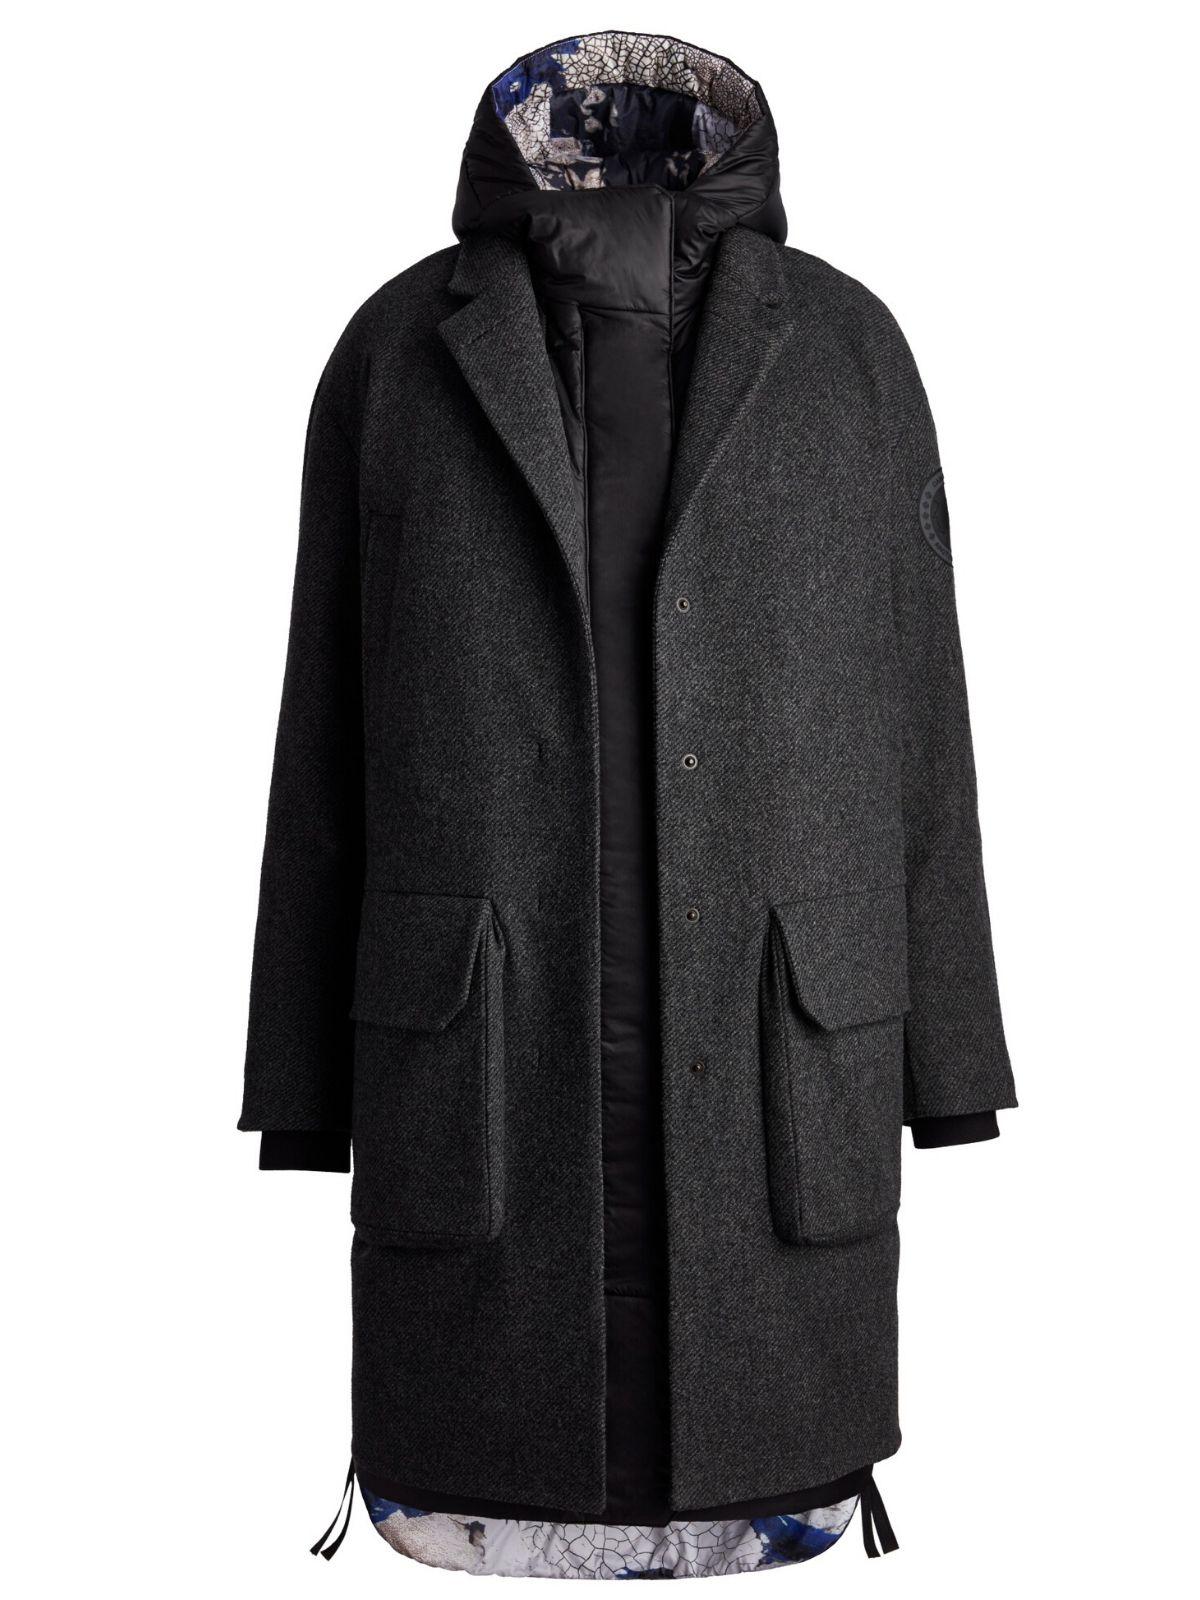 Canada Goose Viedma 4-in-1 coat